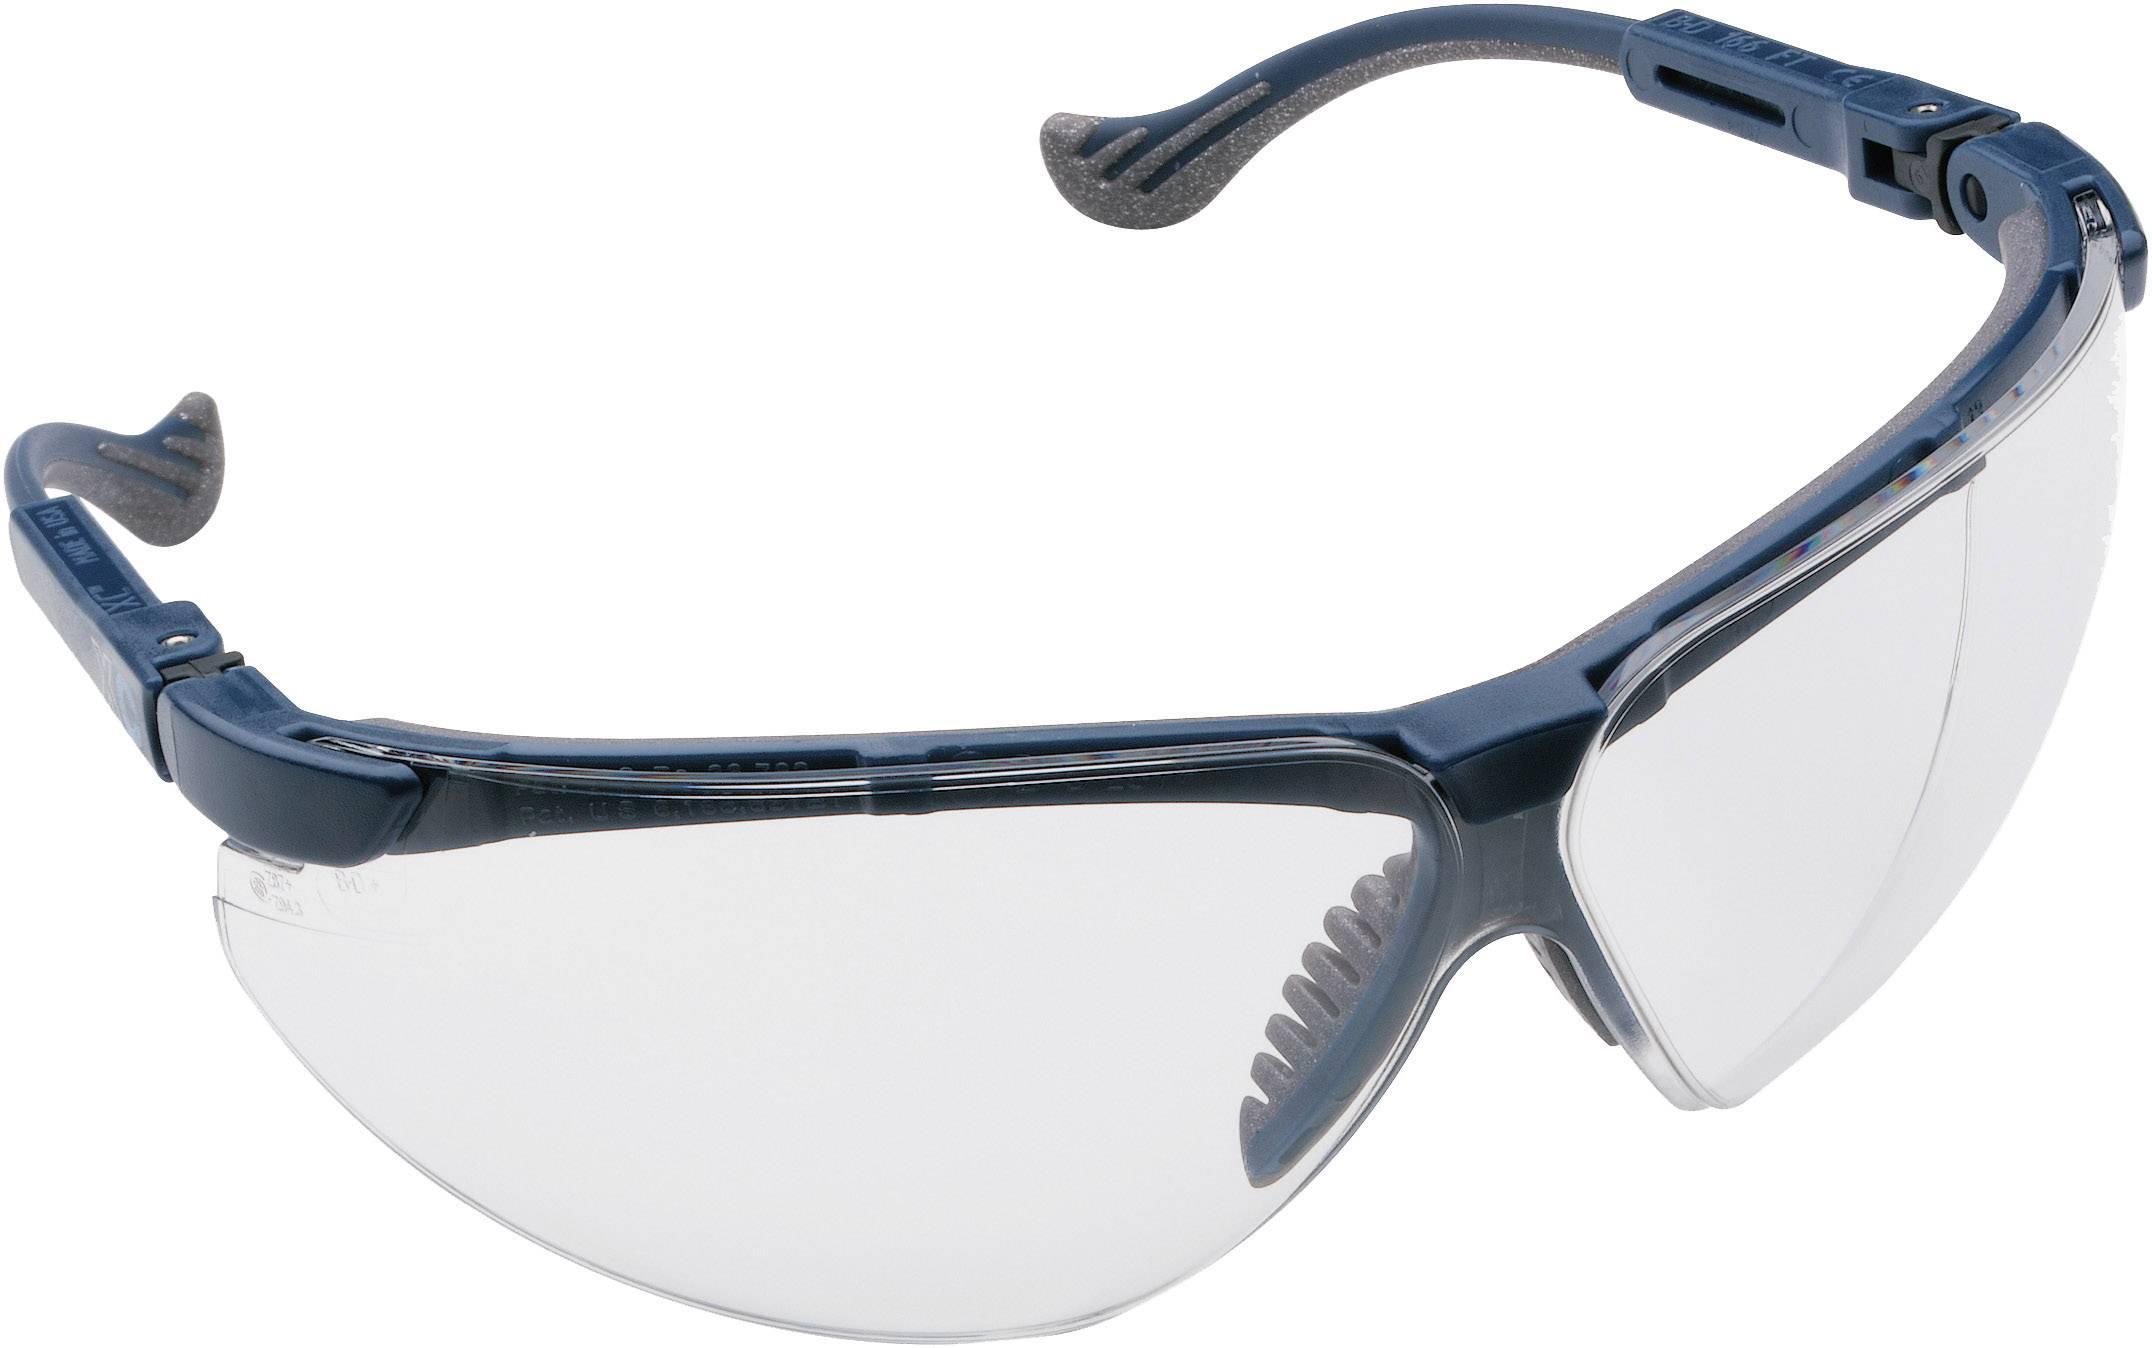 Ochranné okuliare PULSAFE XC Version A/XC Fog Ban